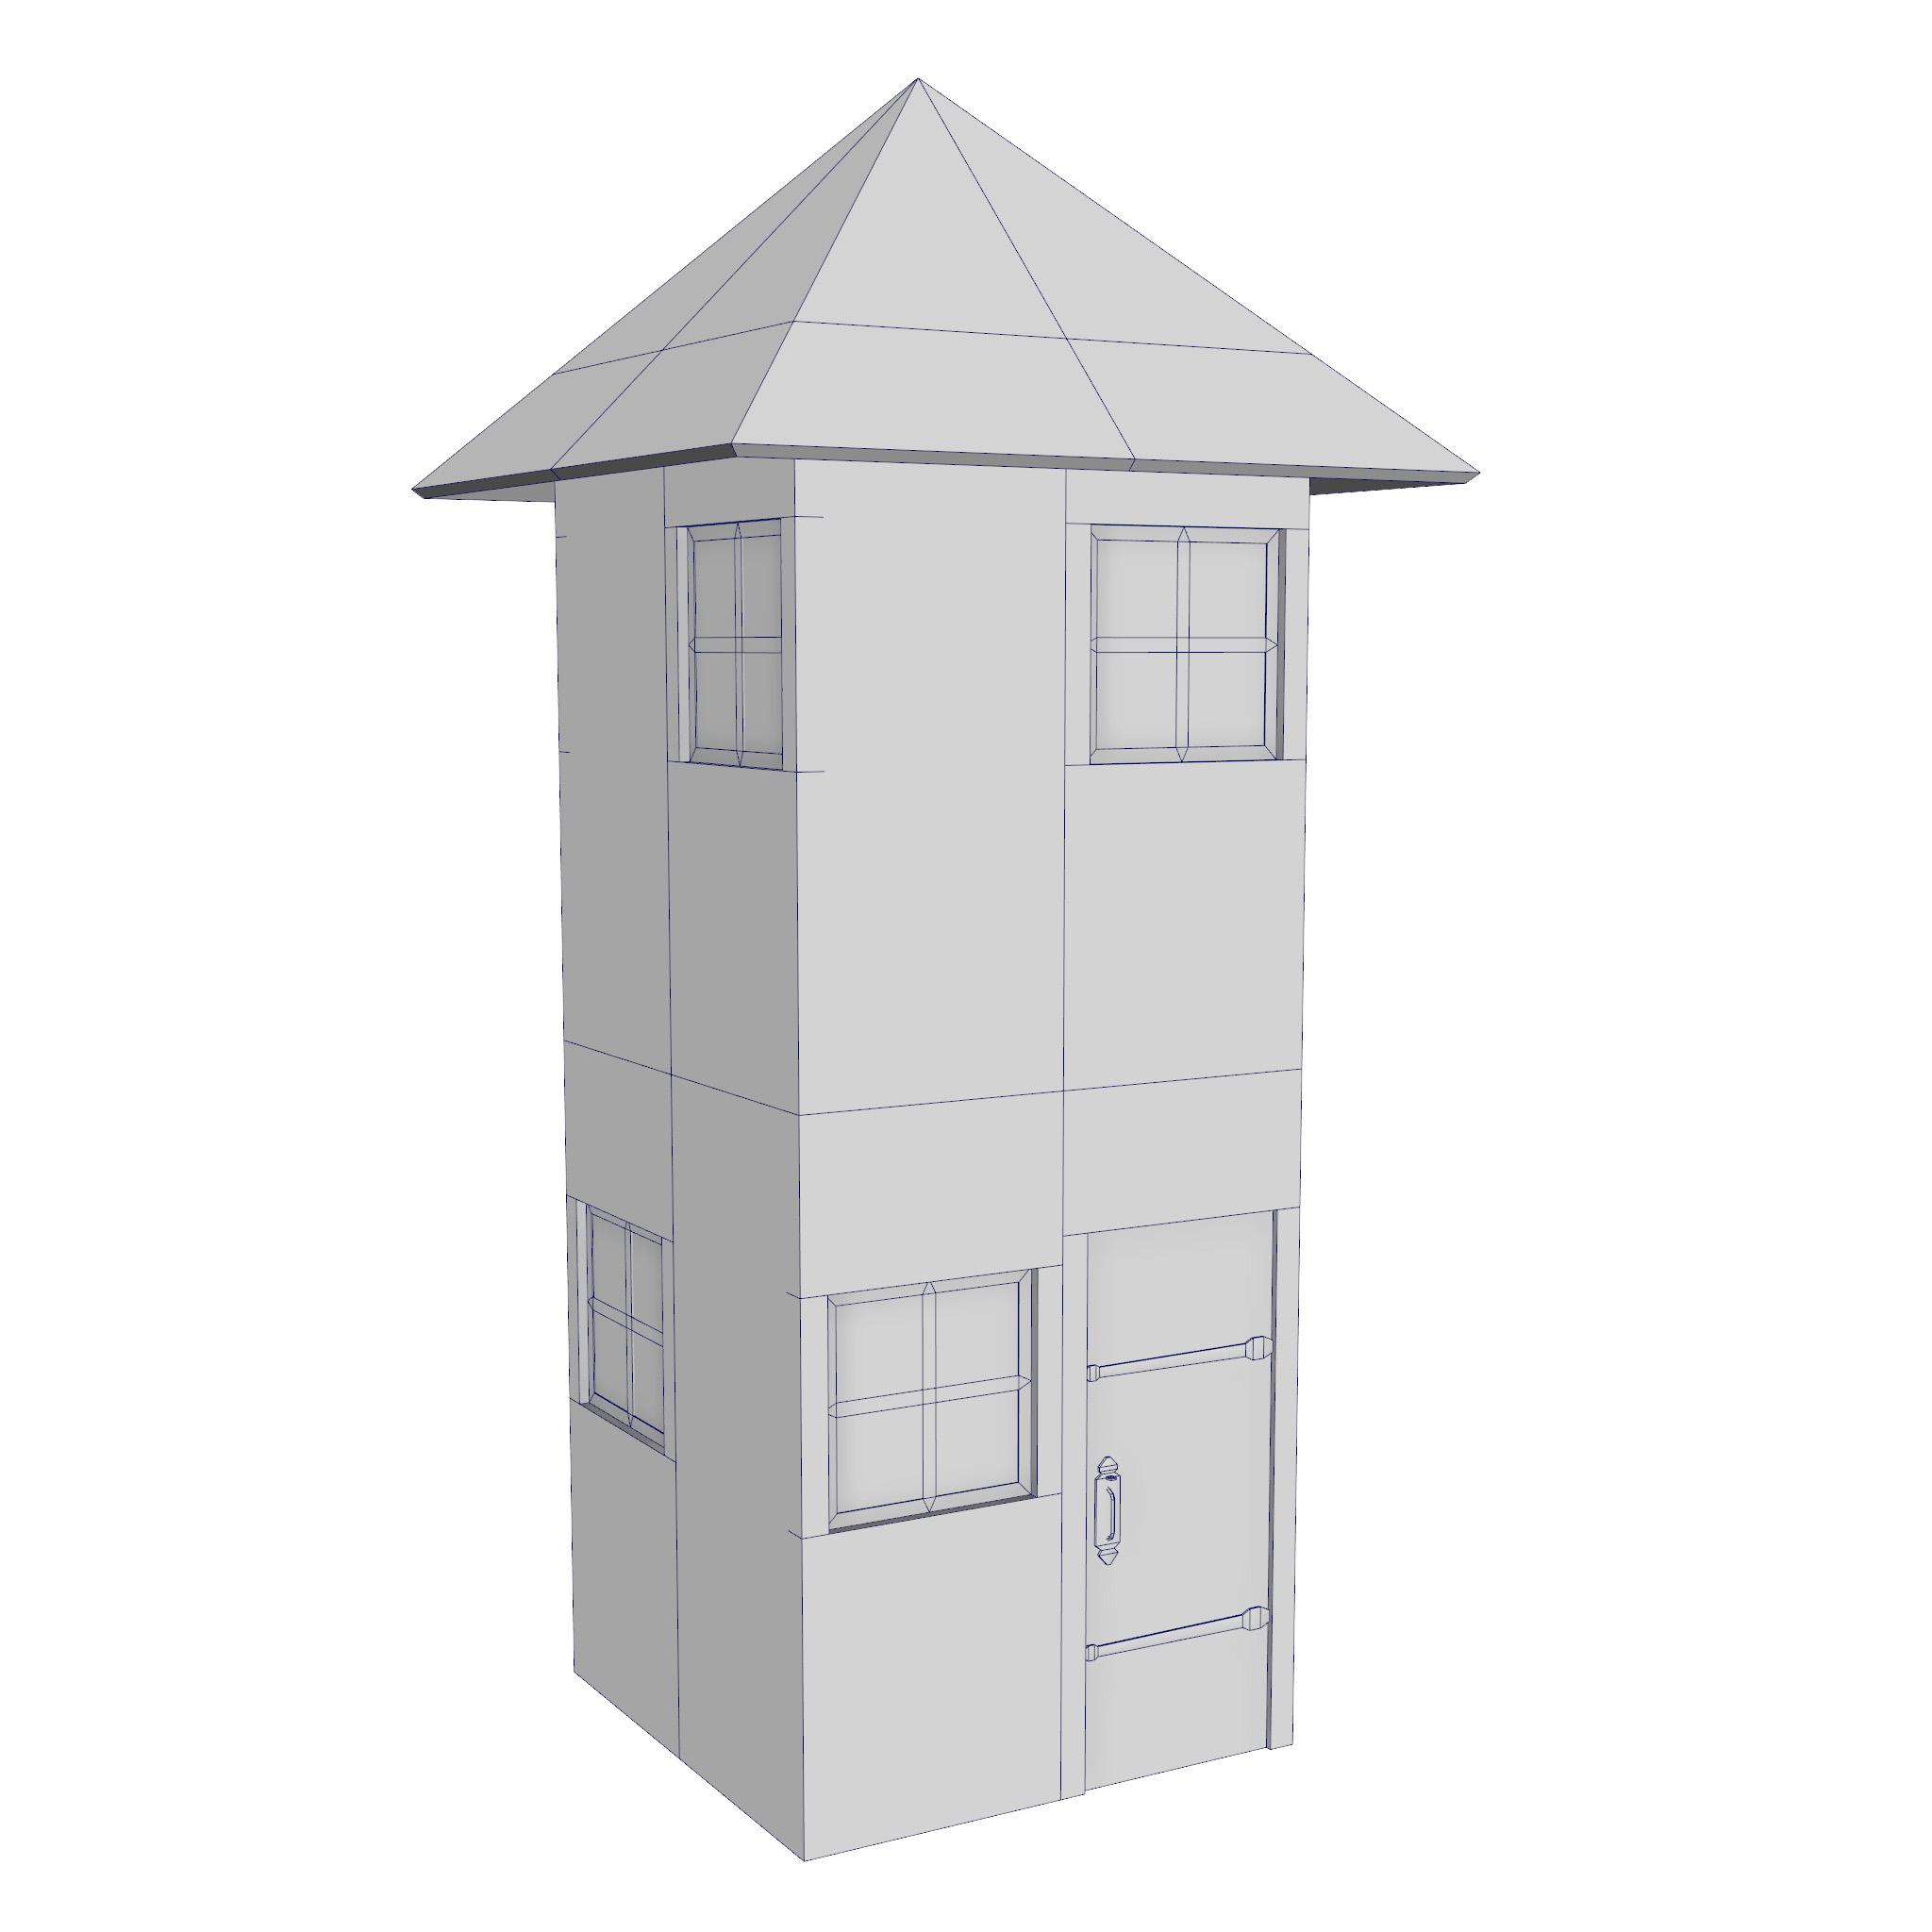 modular brick house set 3d model fbx ma mb 271399